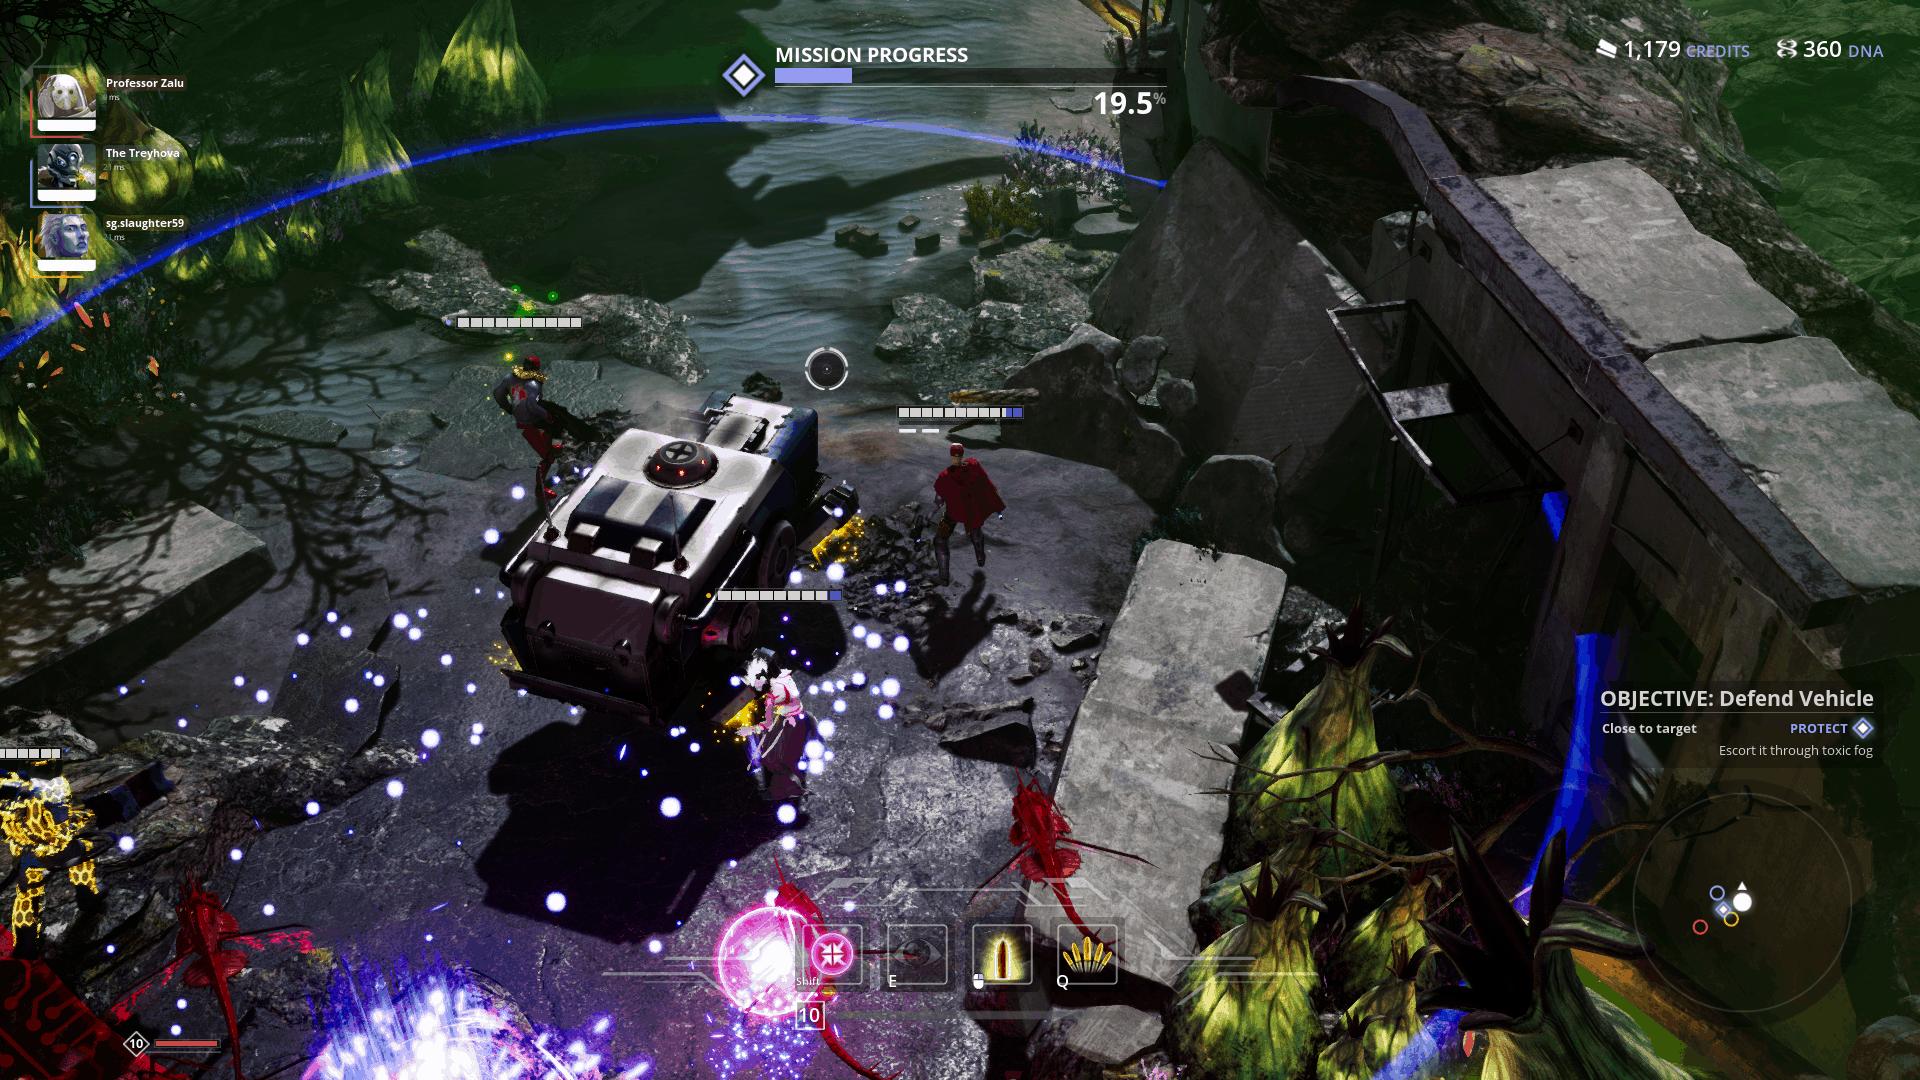 Killsquad game screenshot, defending a vehicle